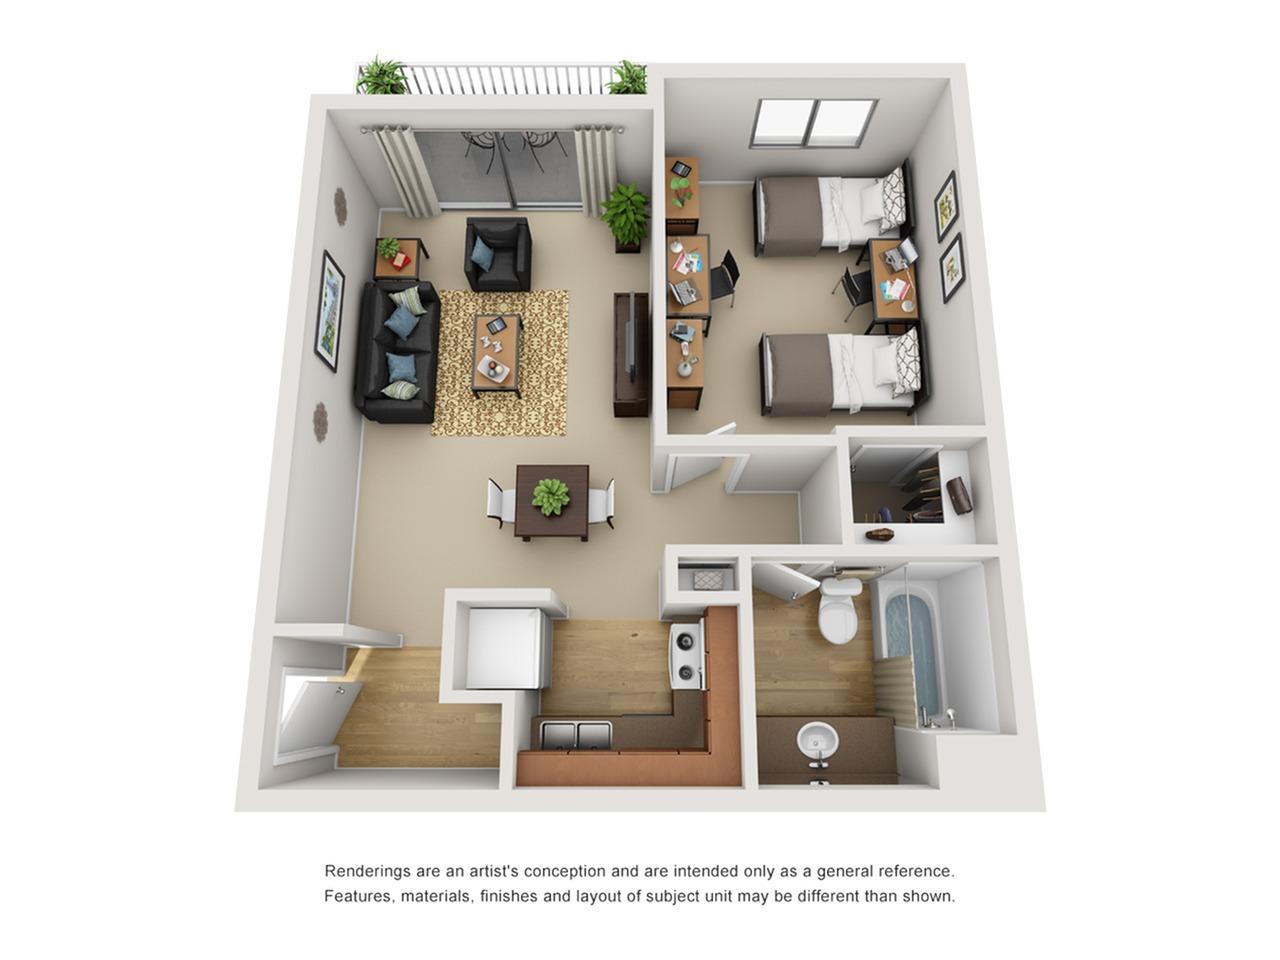 1 bedroom apartment near university of arizona